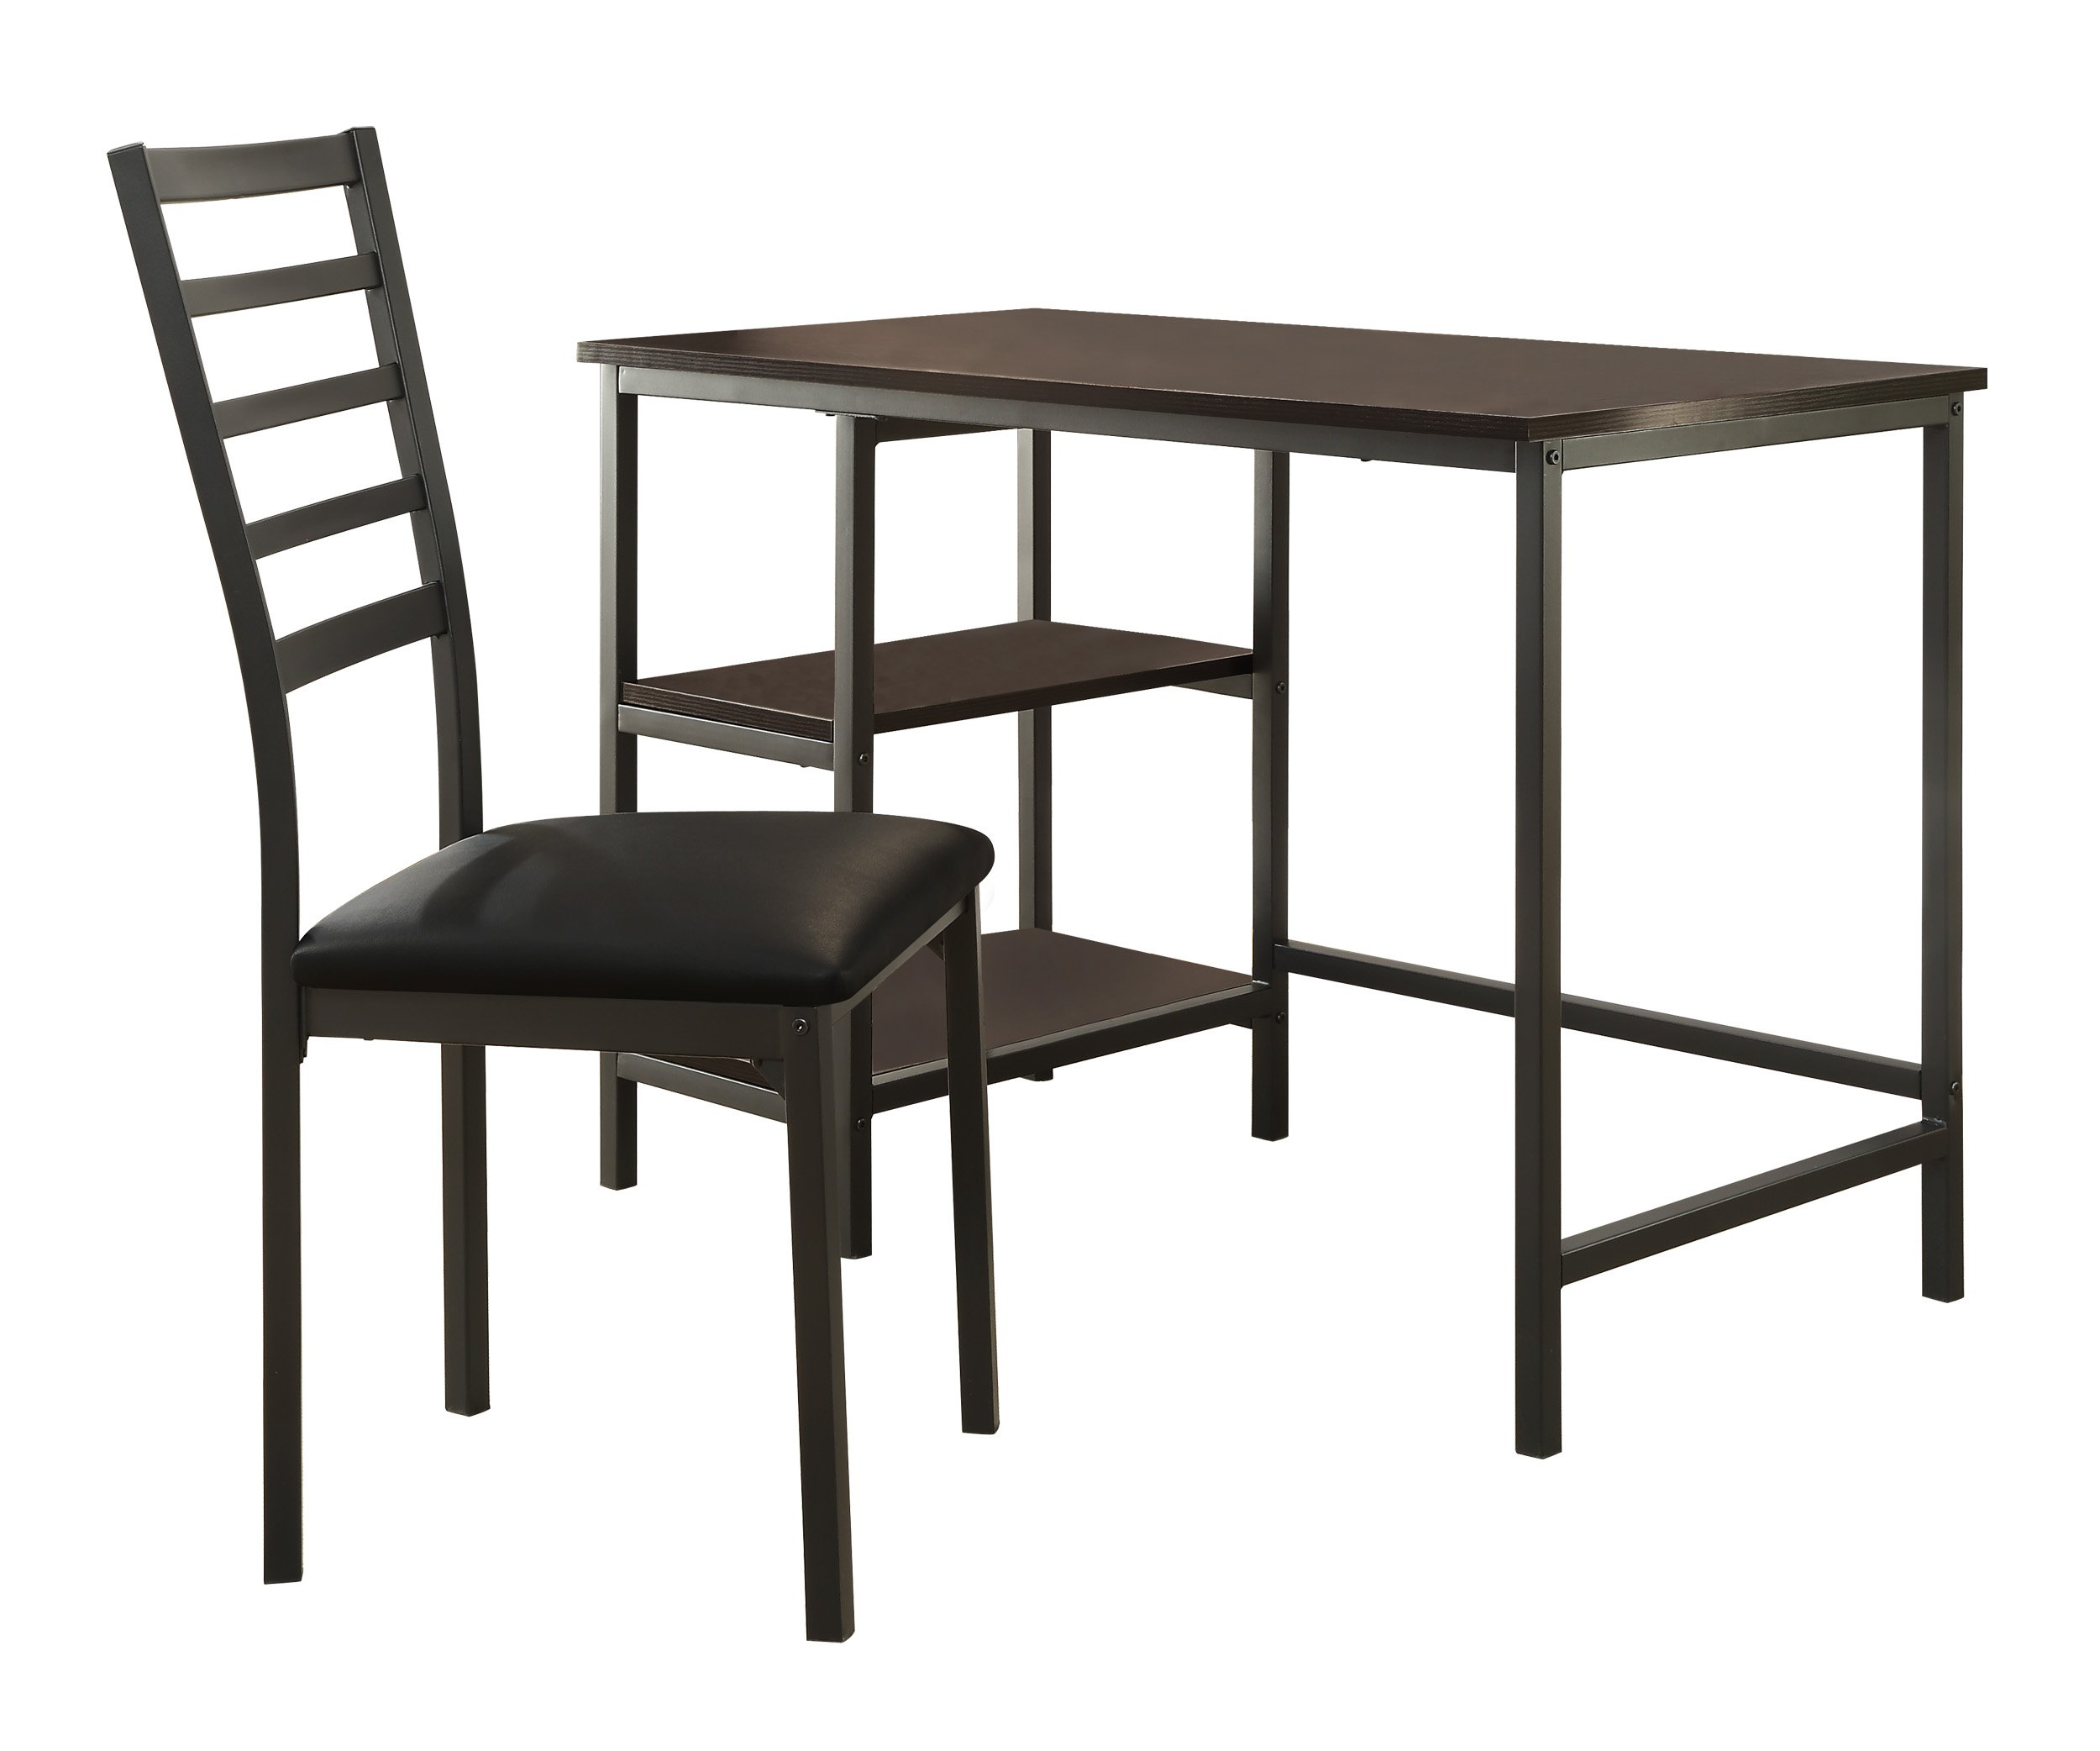 Homelegance Madigan Metal Writing Desk with Slat Back Chair, Black